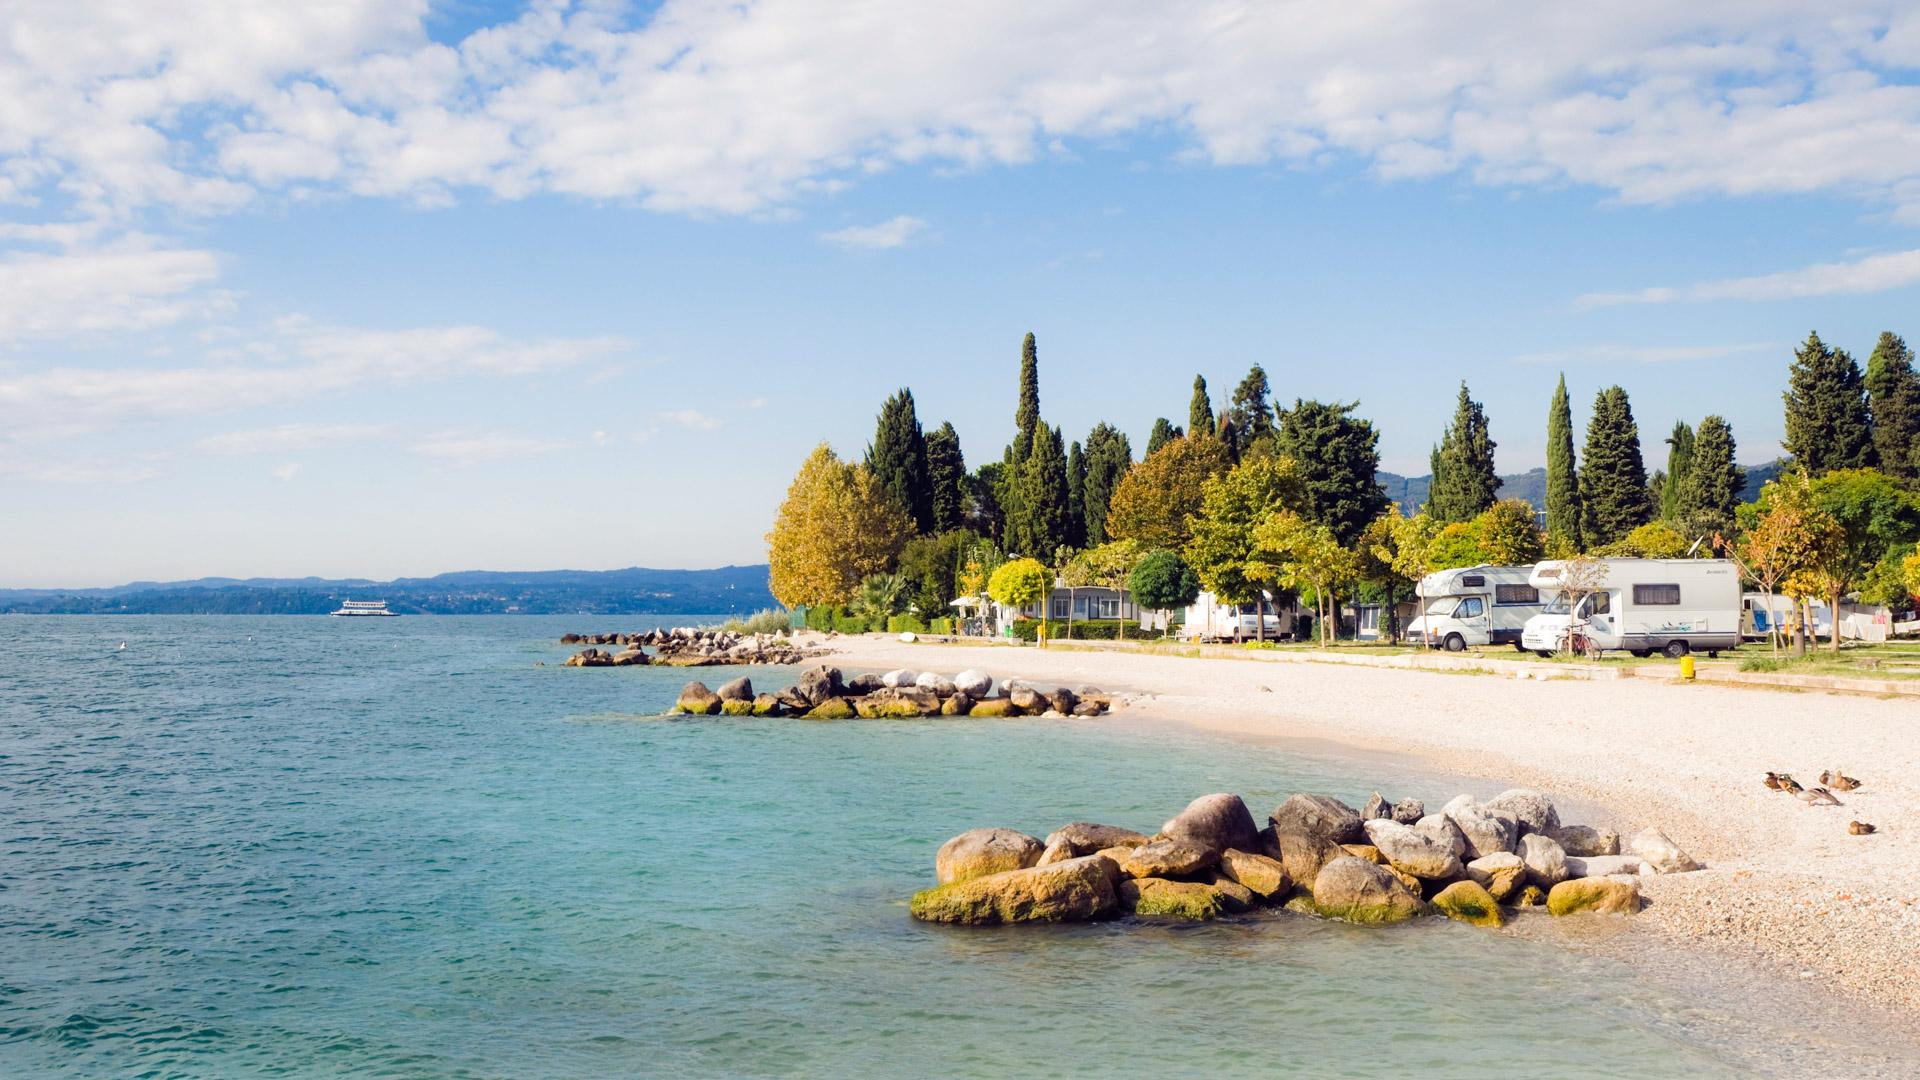 Mobilheim Kaufen Lago Maggiore : Camping lago maggiore: campingplätze adac reisen